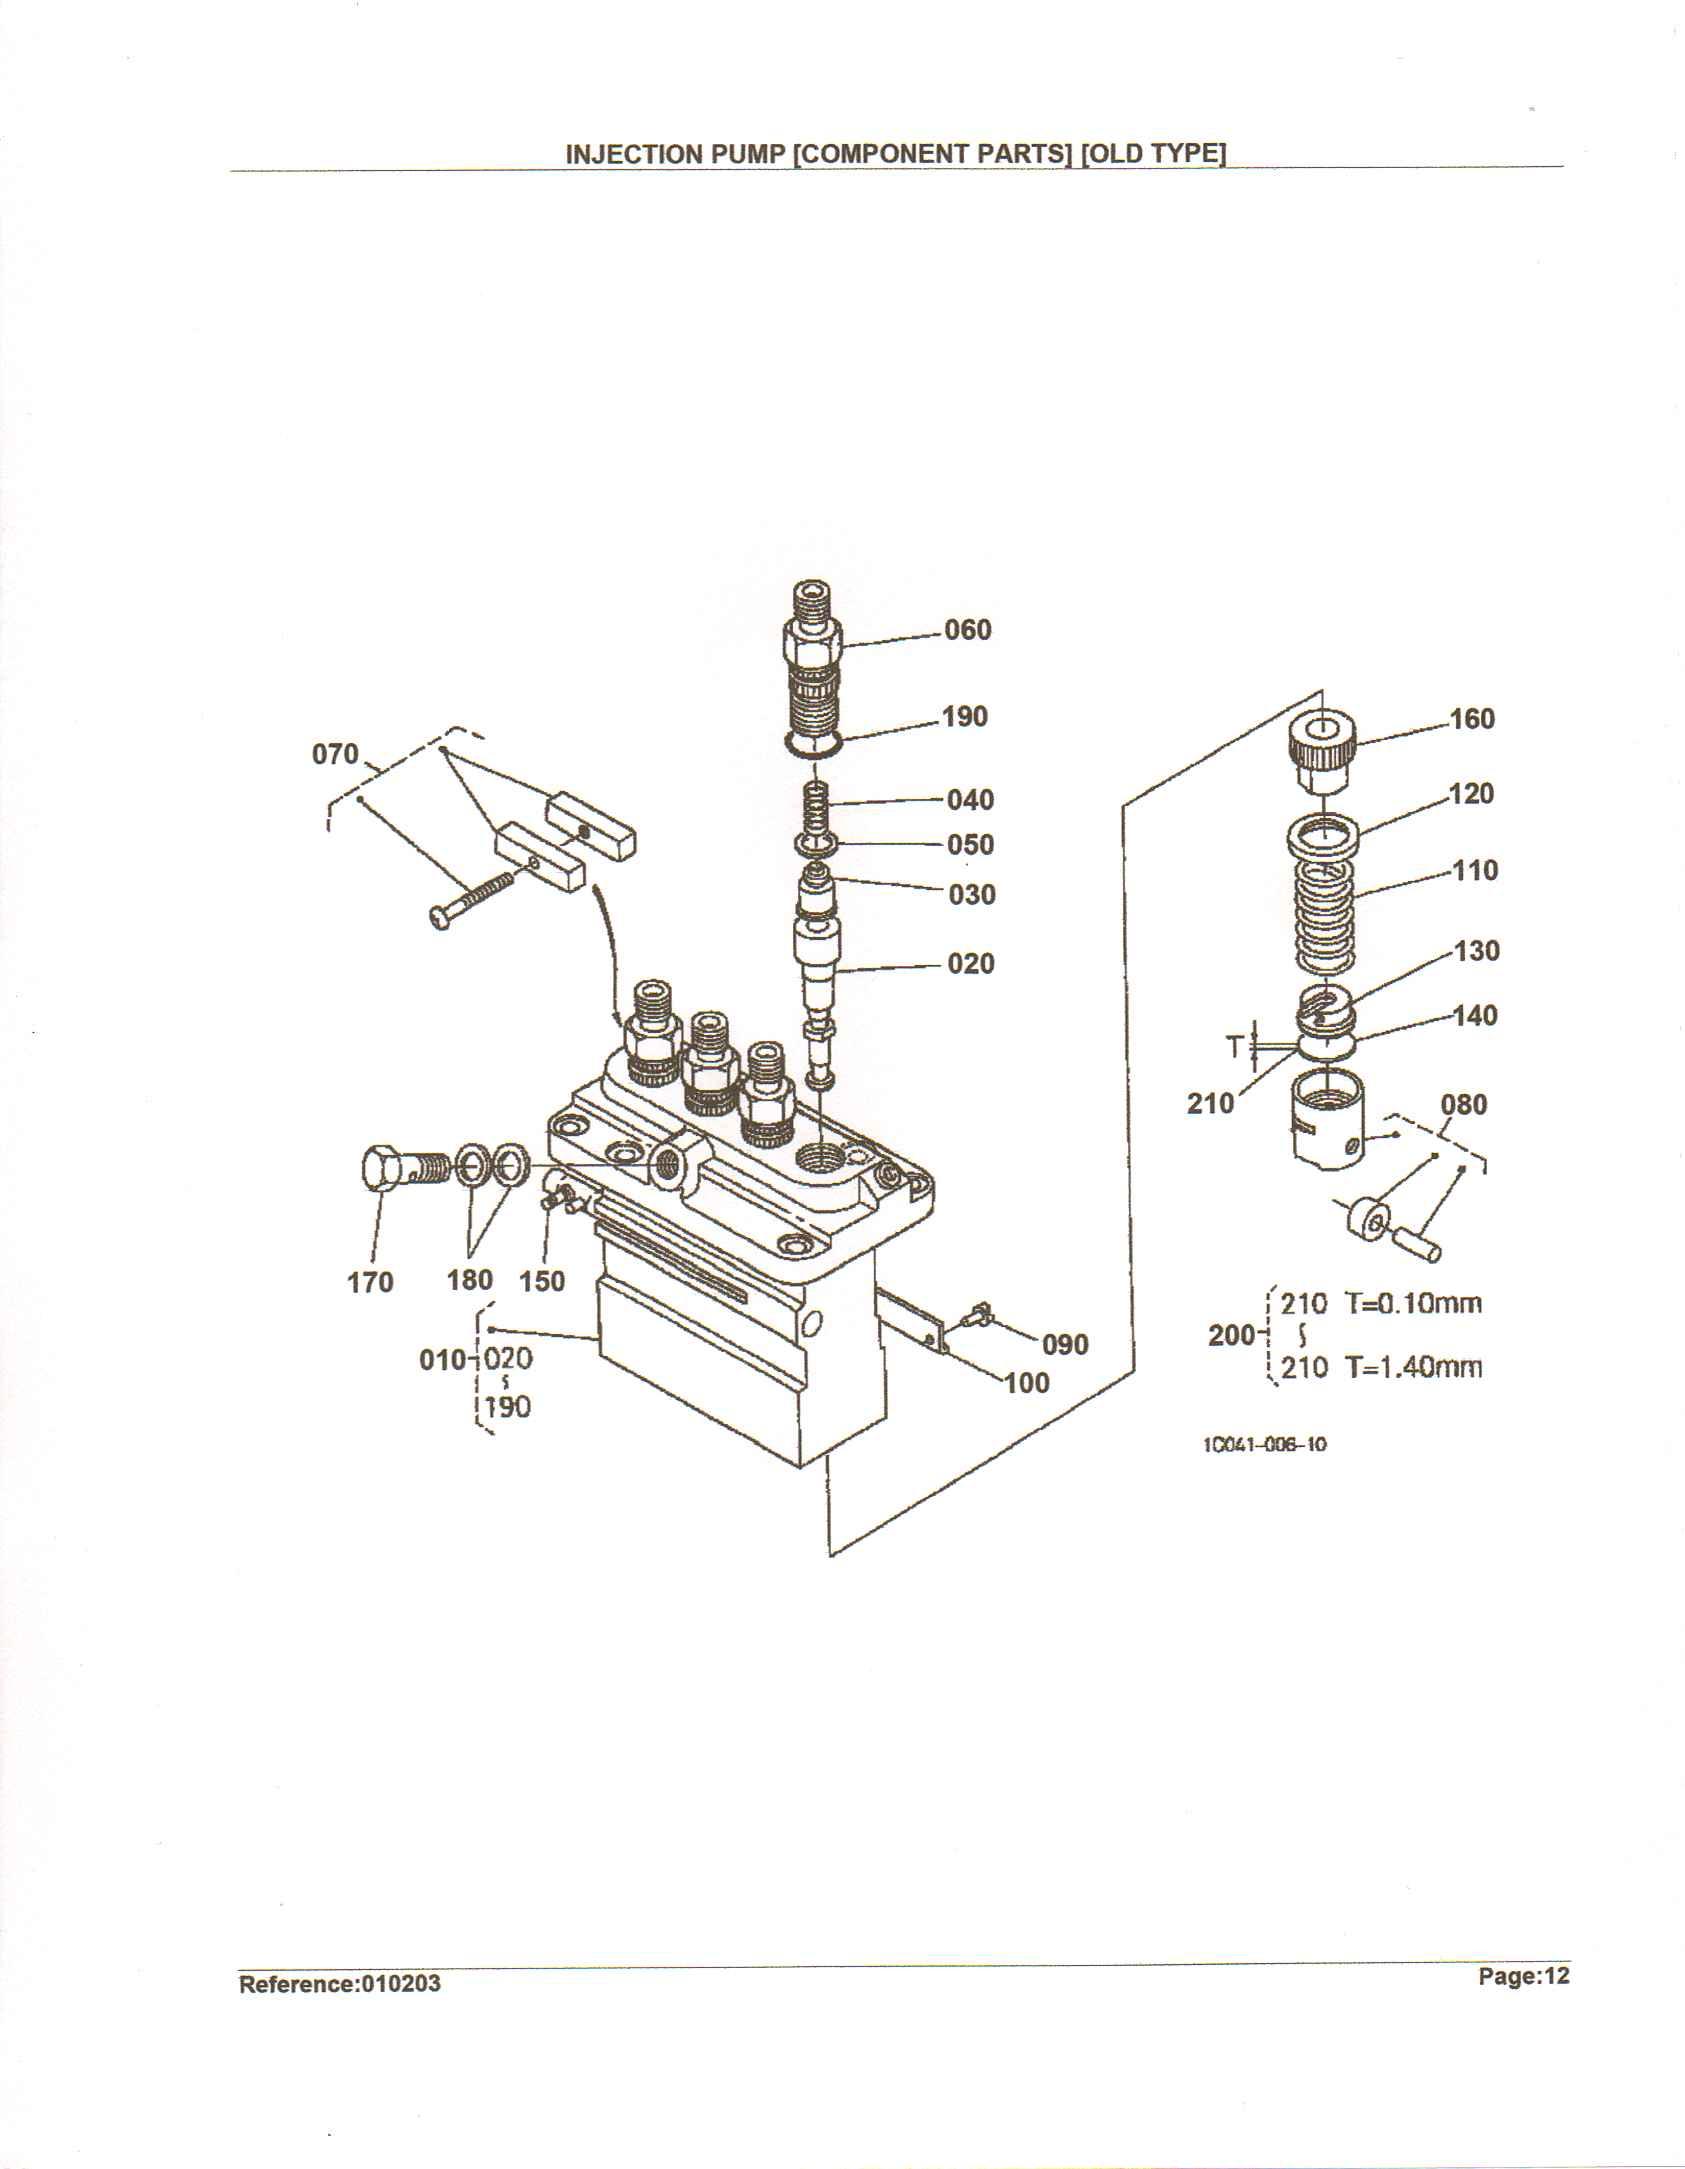 kubota injection pump diagram within kubota wiring and